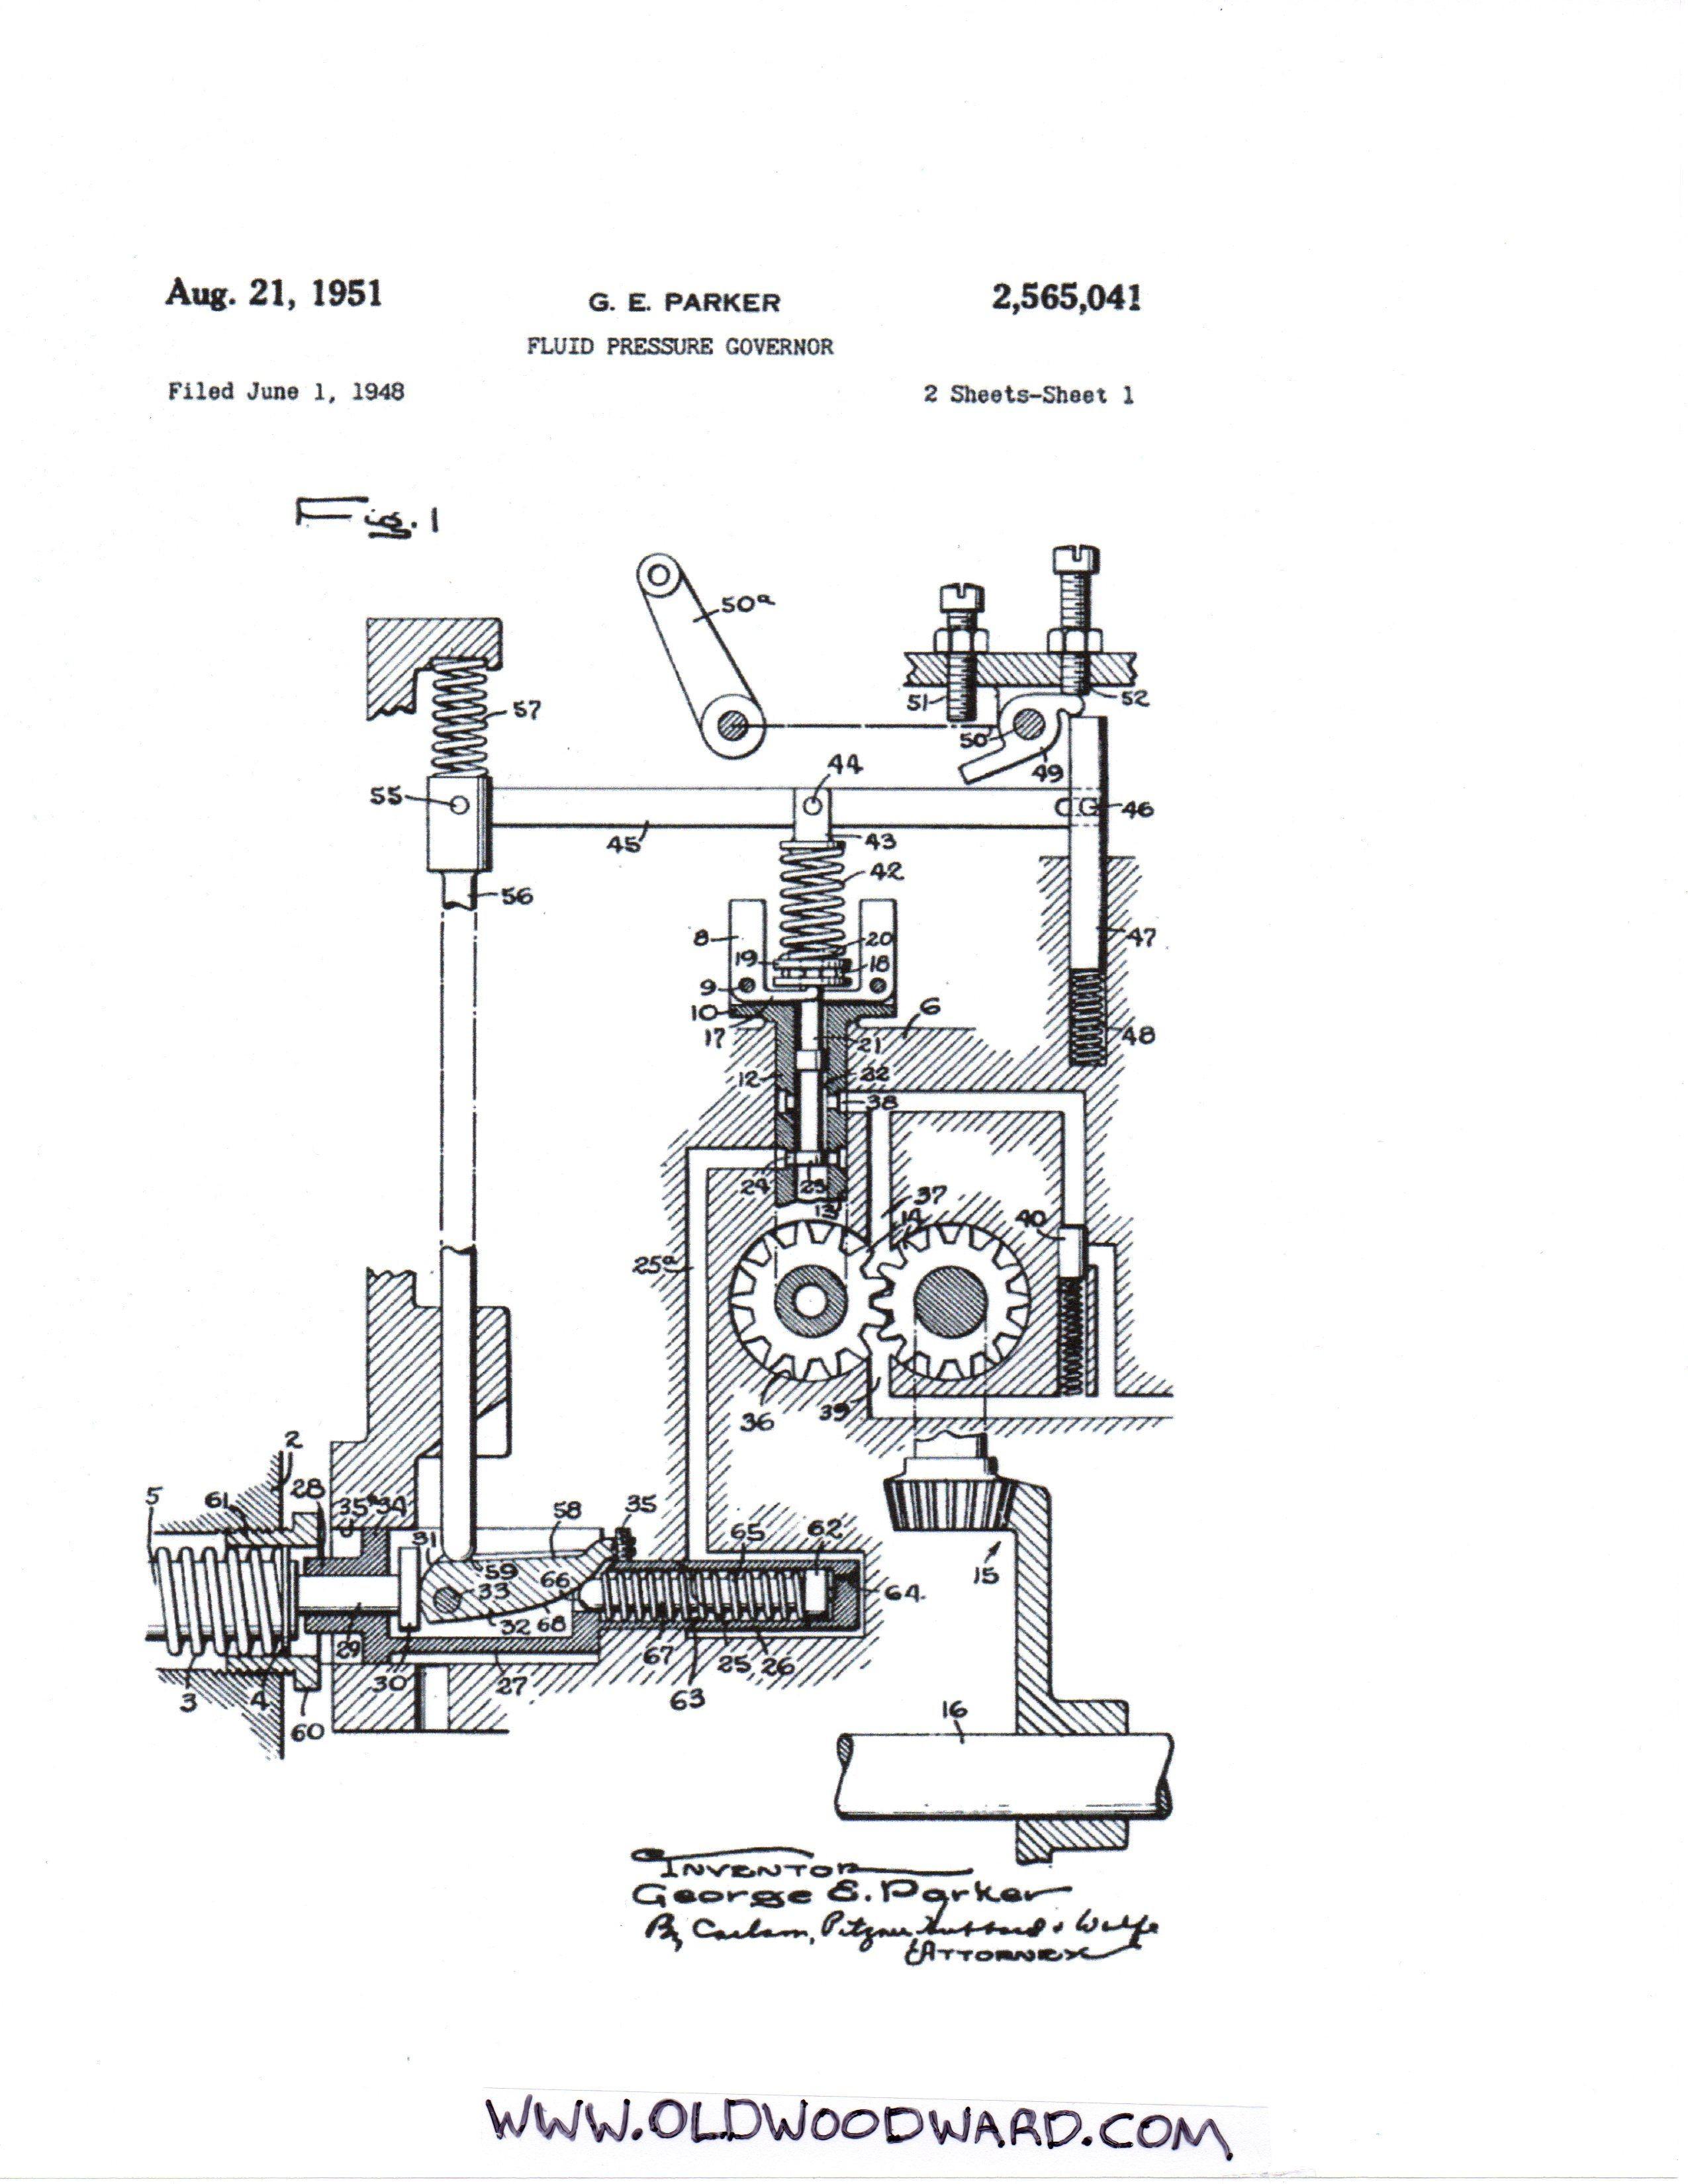 Diagram Of Diesel Engine Woodward Type Pm Governor Patent Of Diagram Of Diesel Engine